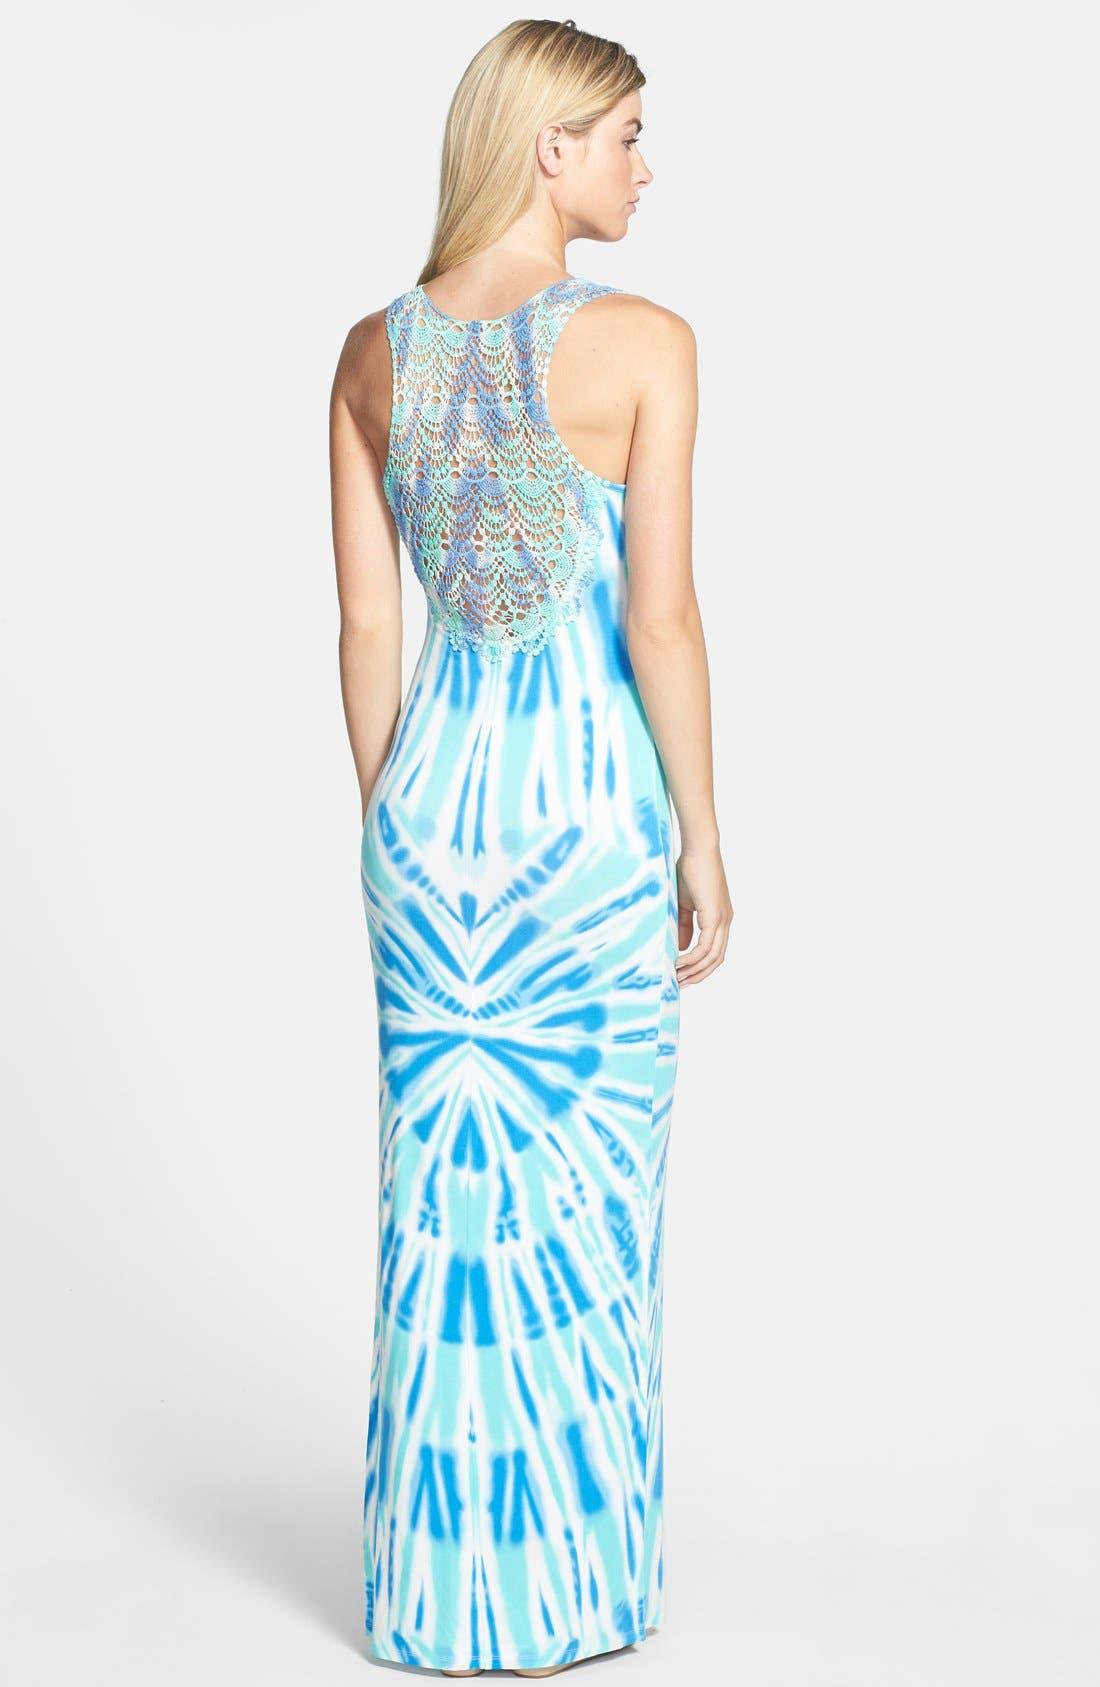 Alternate Image 2  - Felicity & Coco Crochet Back Tie Dye Maxi Dress (Regular & Petite) (Nordstrom Exclusive)